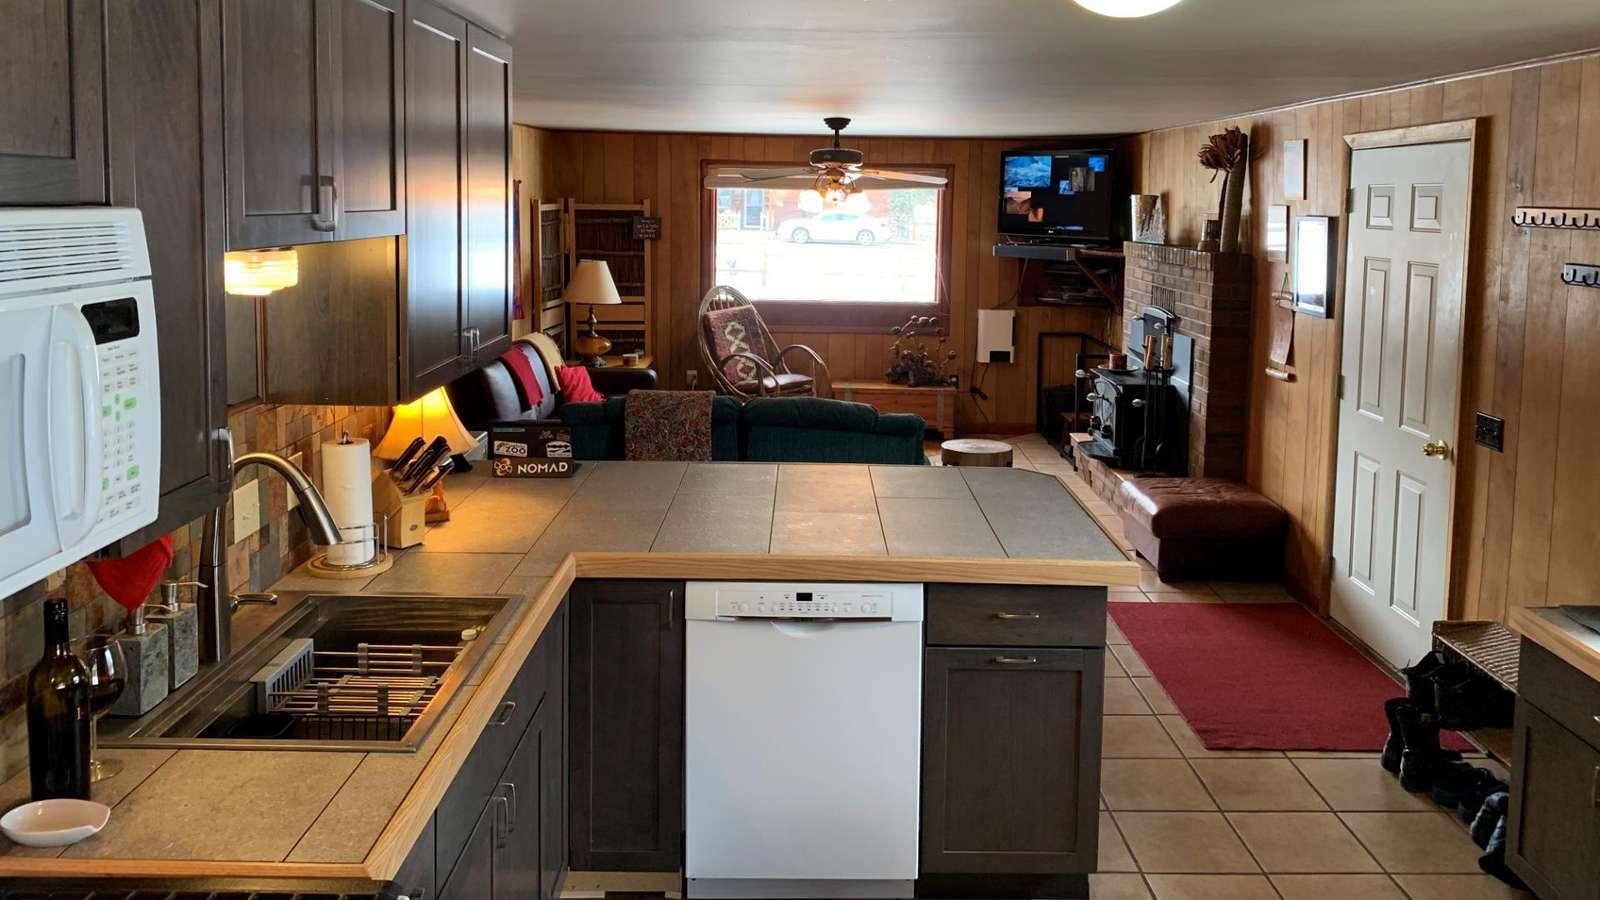 Kitchen with Island & Dishwasher